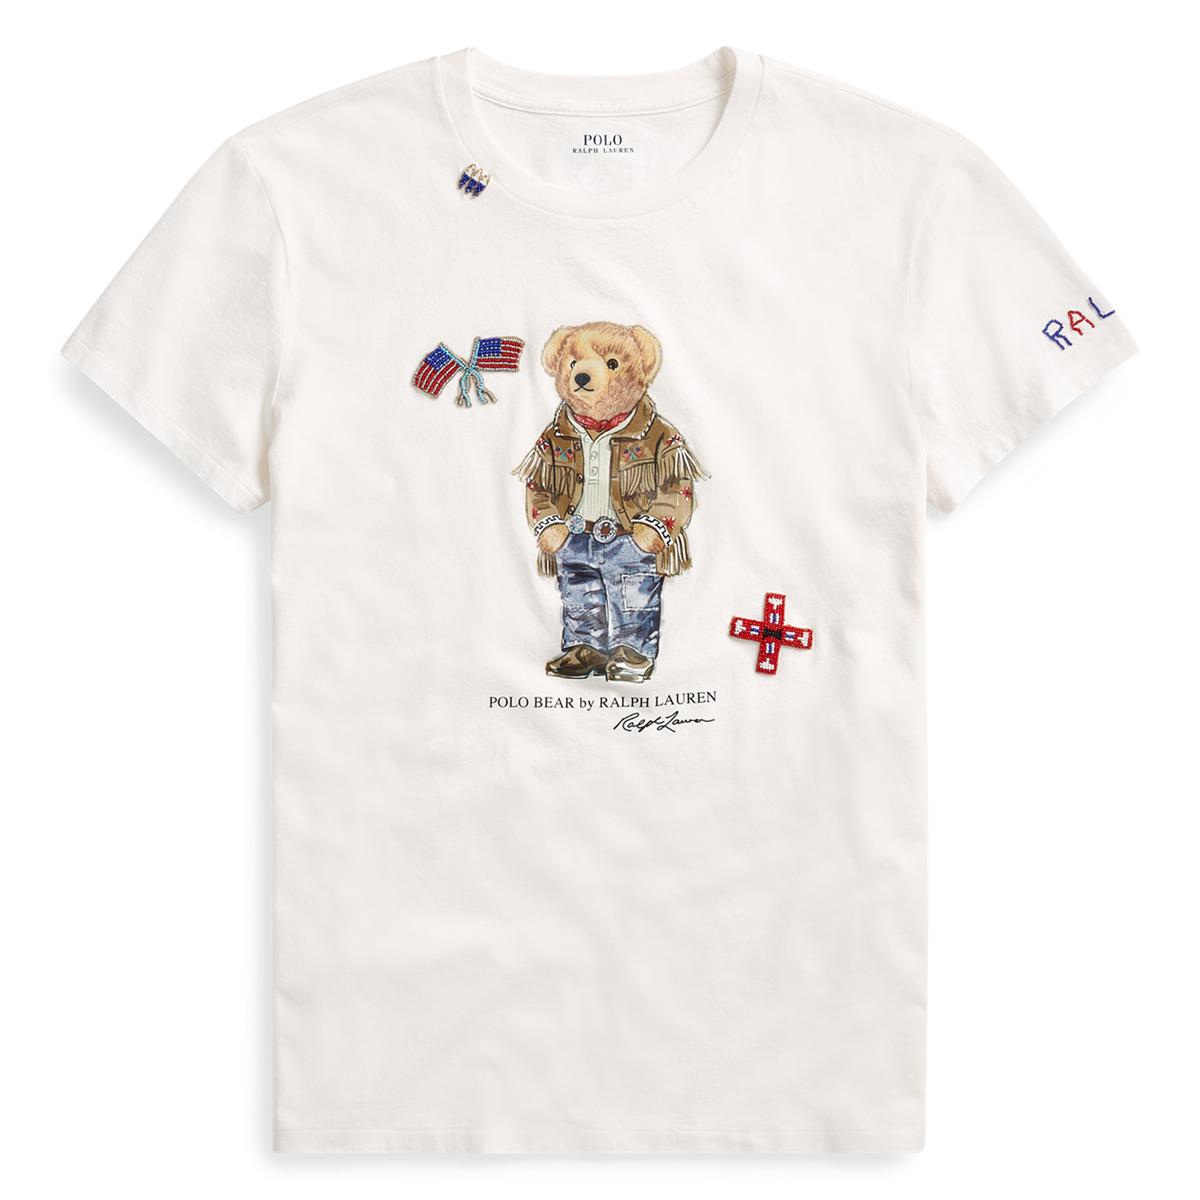 Cotton T Cotton Shirt Bear Bear T Polo Polo Shirt N0wPk8OXnZ